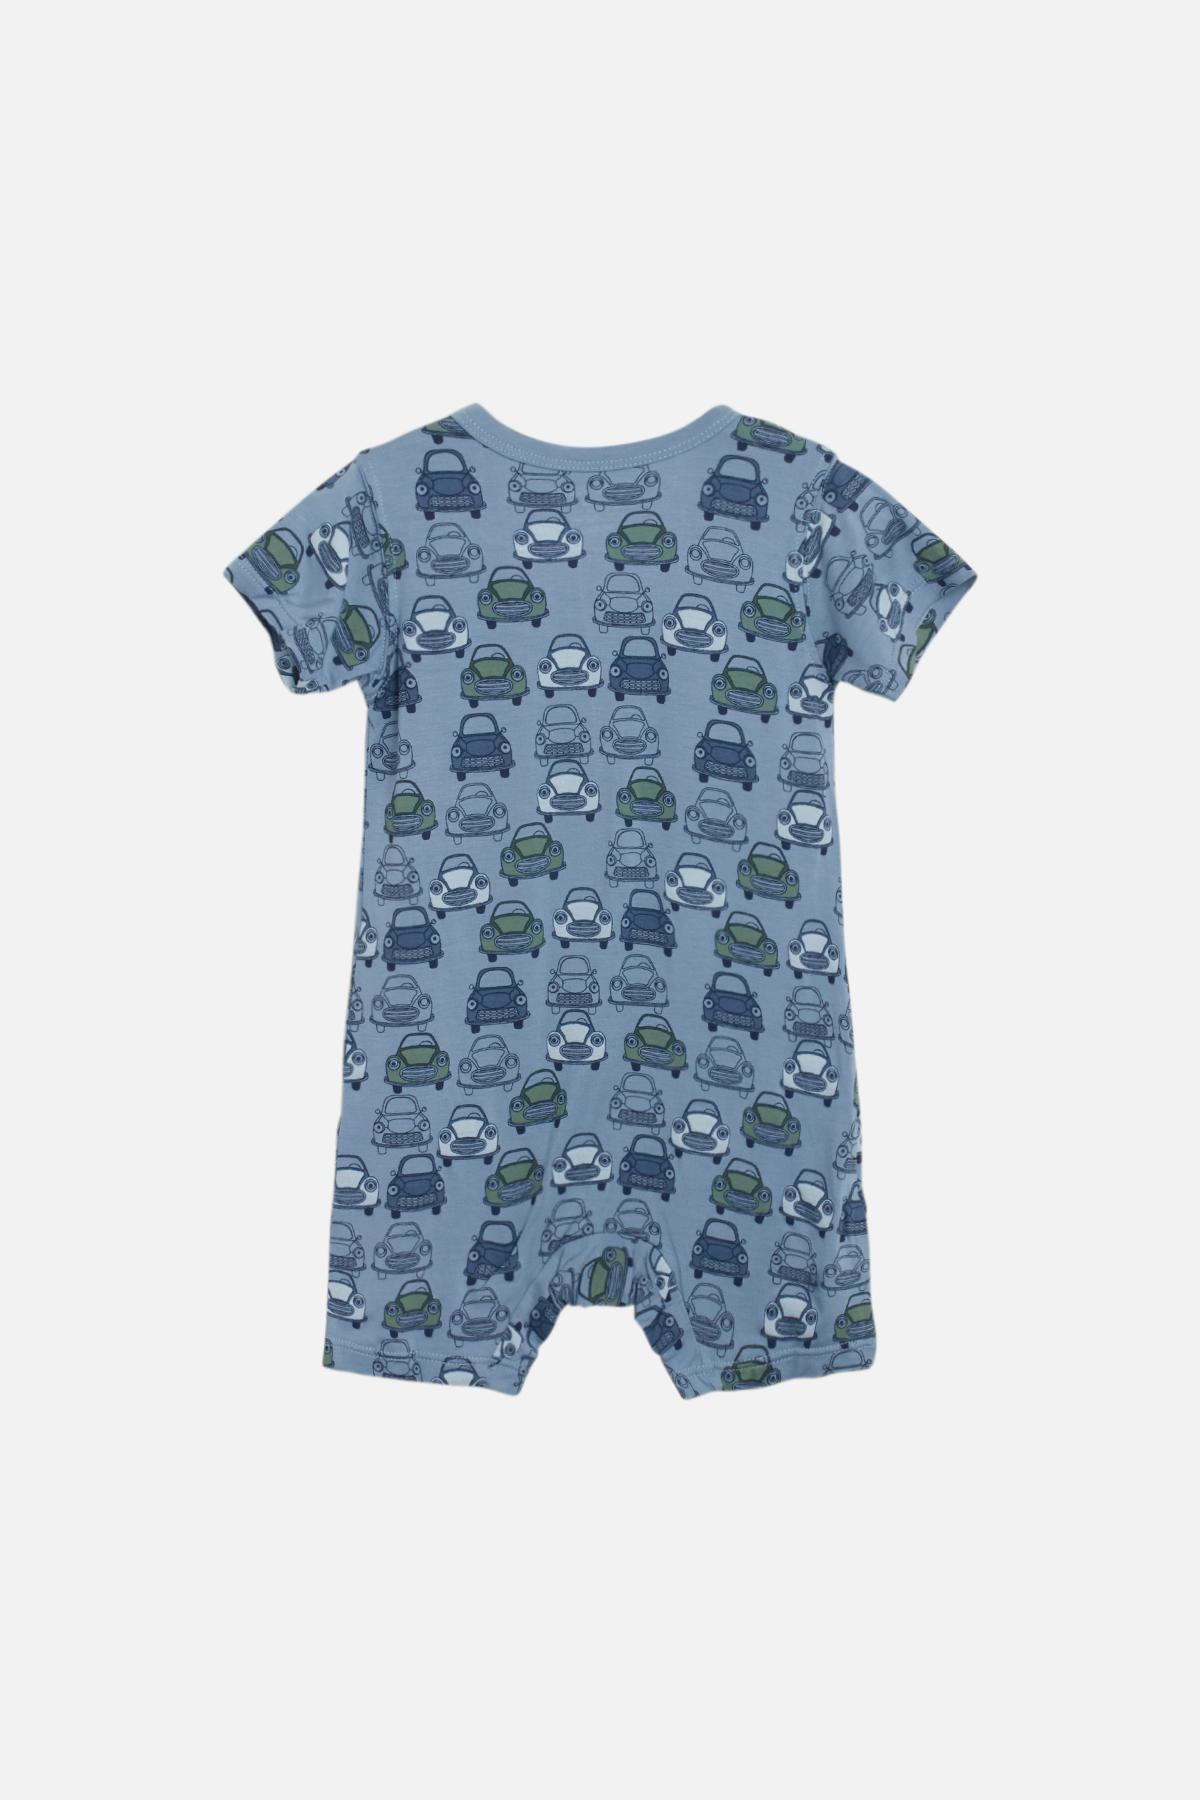 Kids Bamboo - Mungo - Nightwear